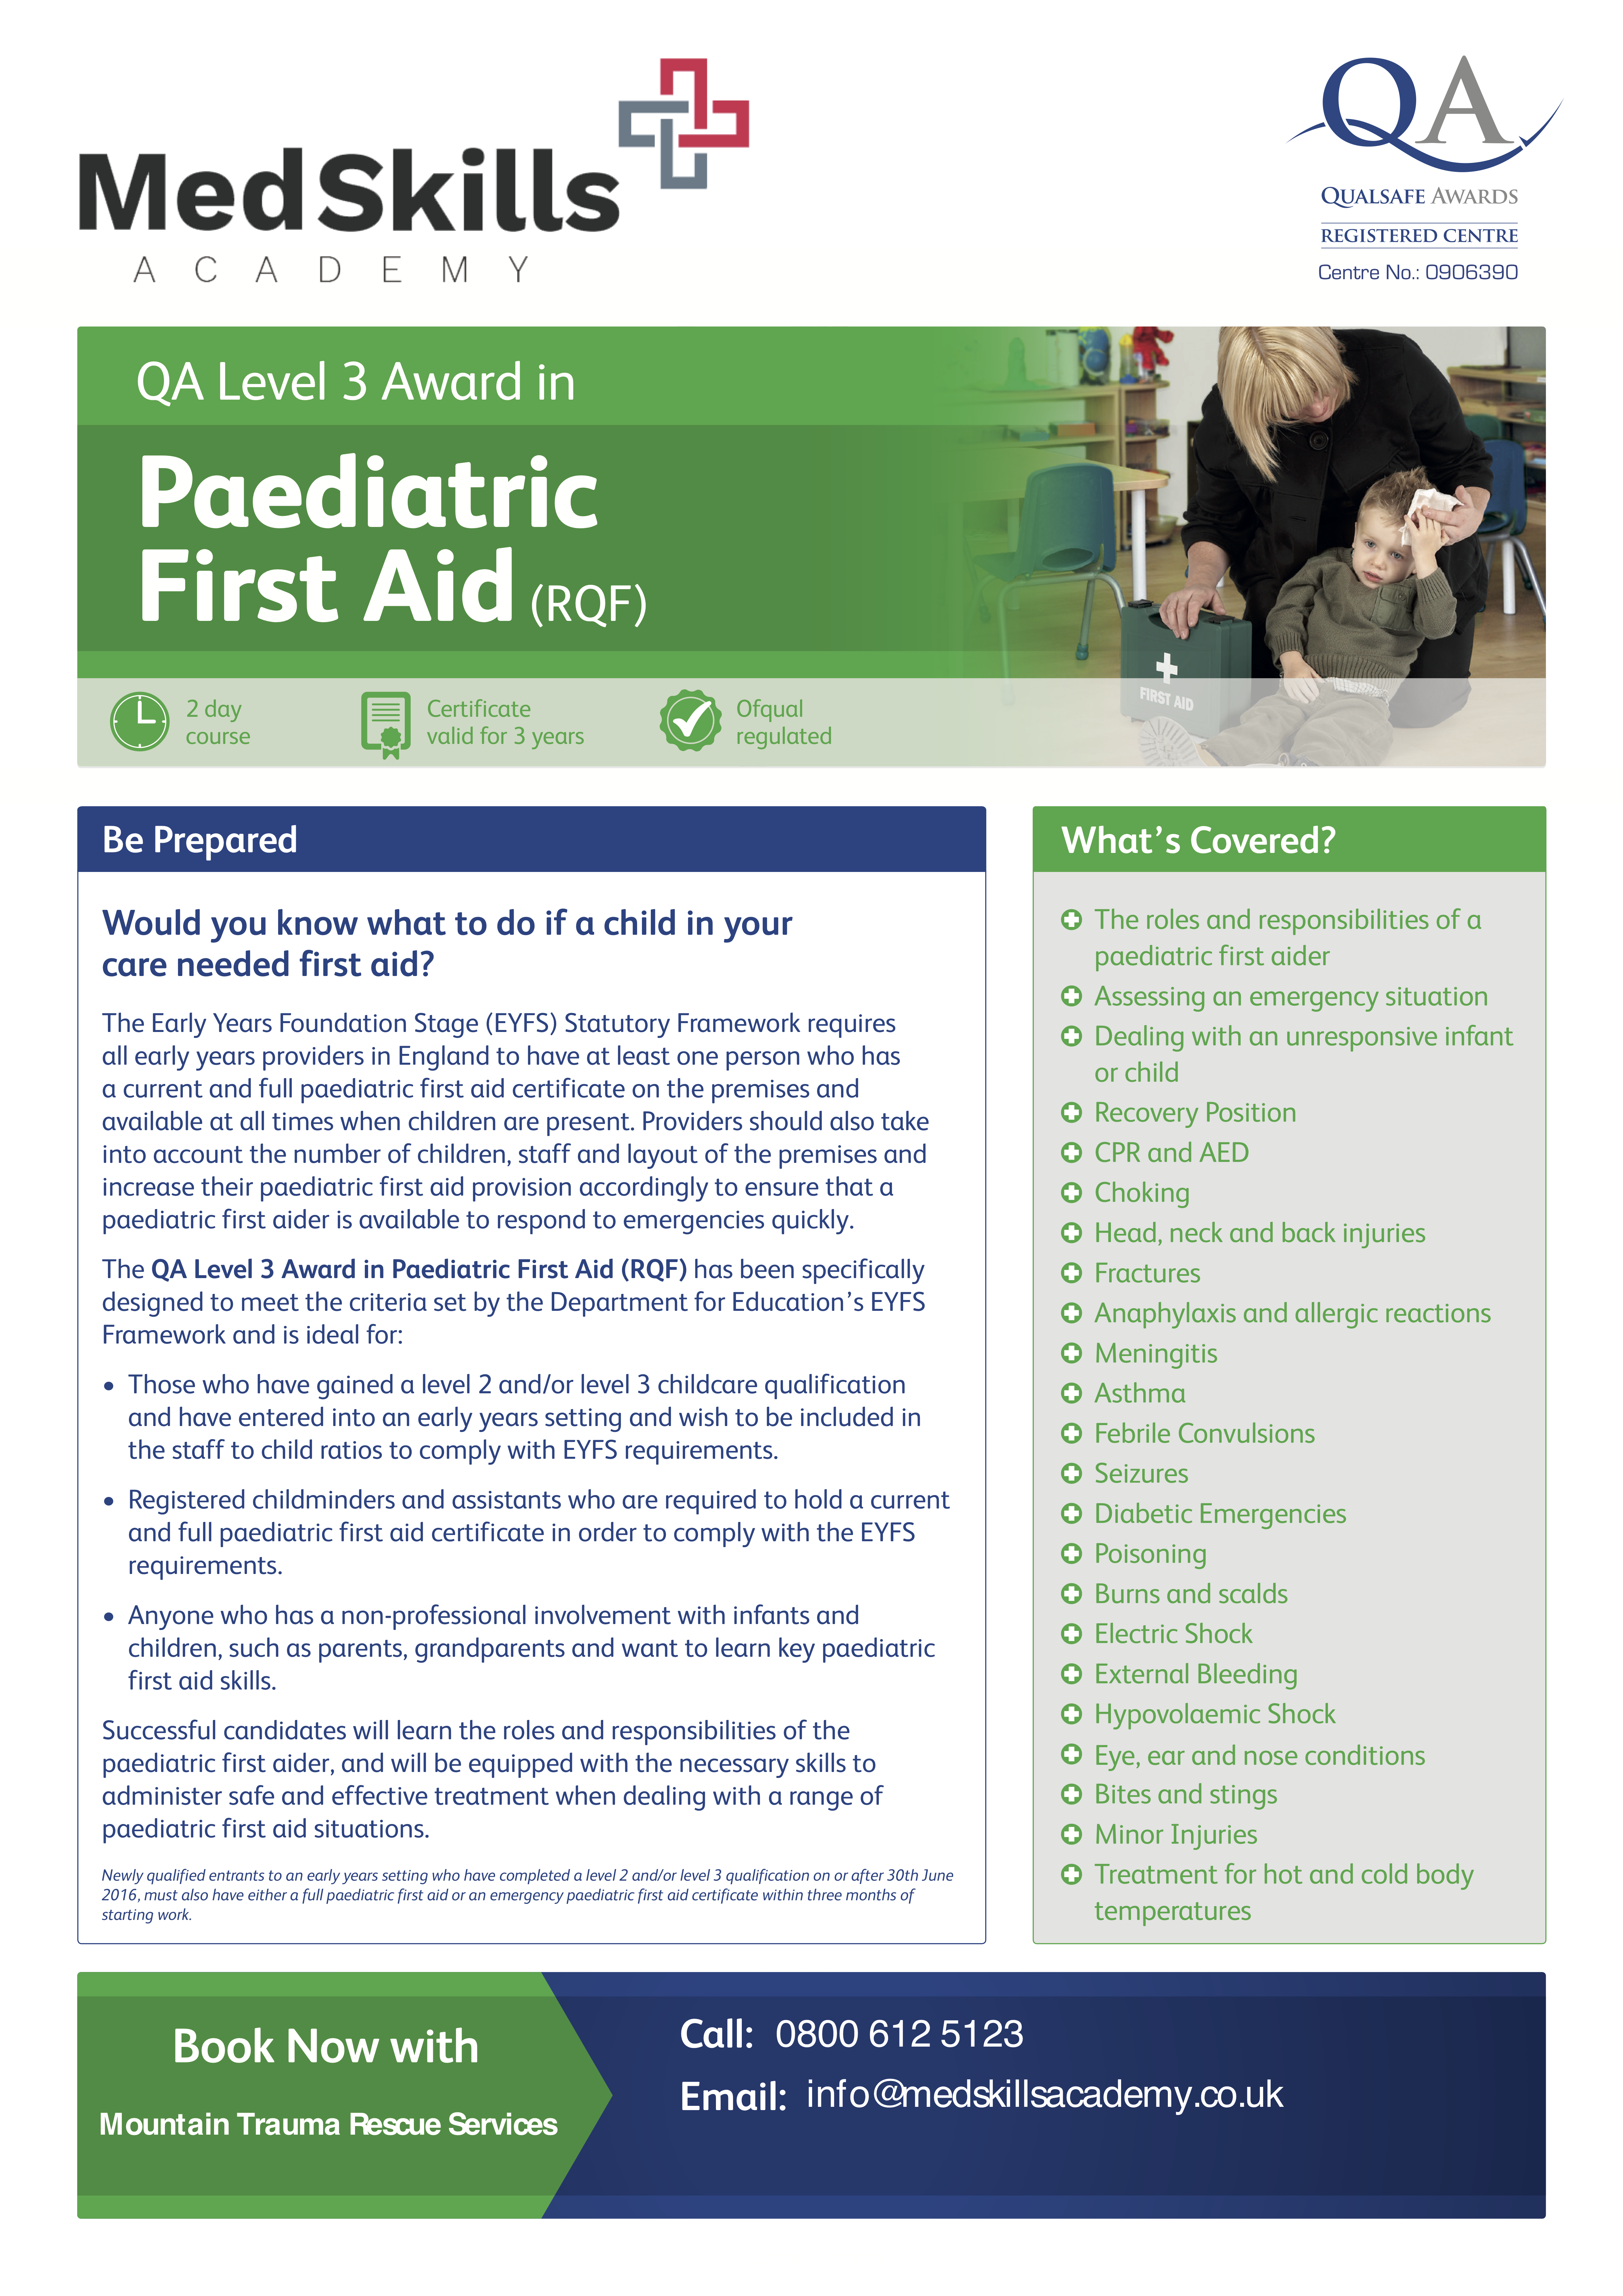 QA_Centre_Marketing_-_Paediatric_First_Aid_Flyer-2